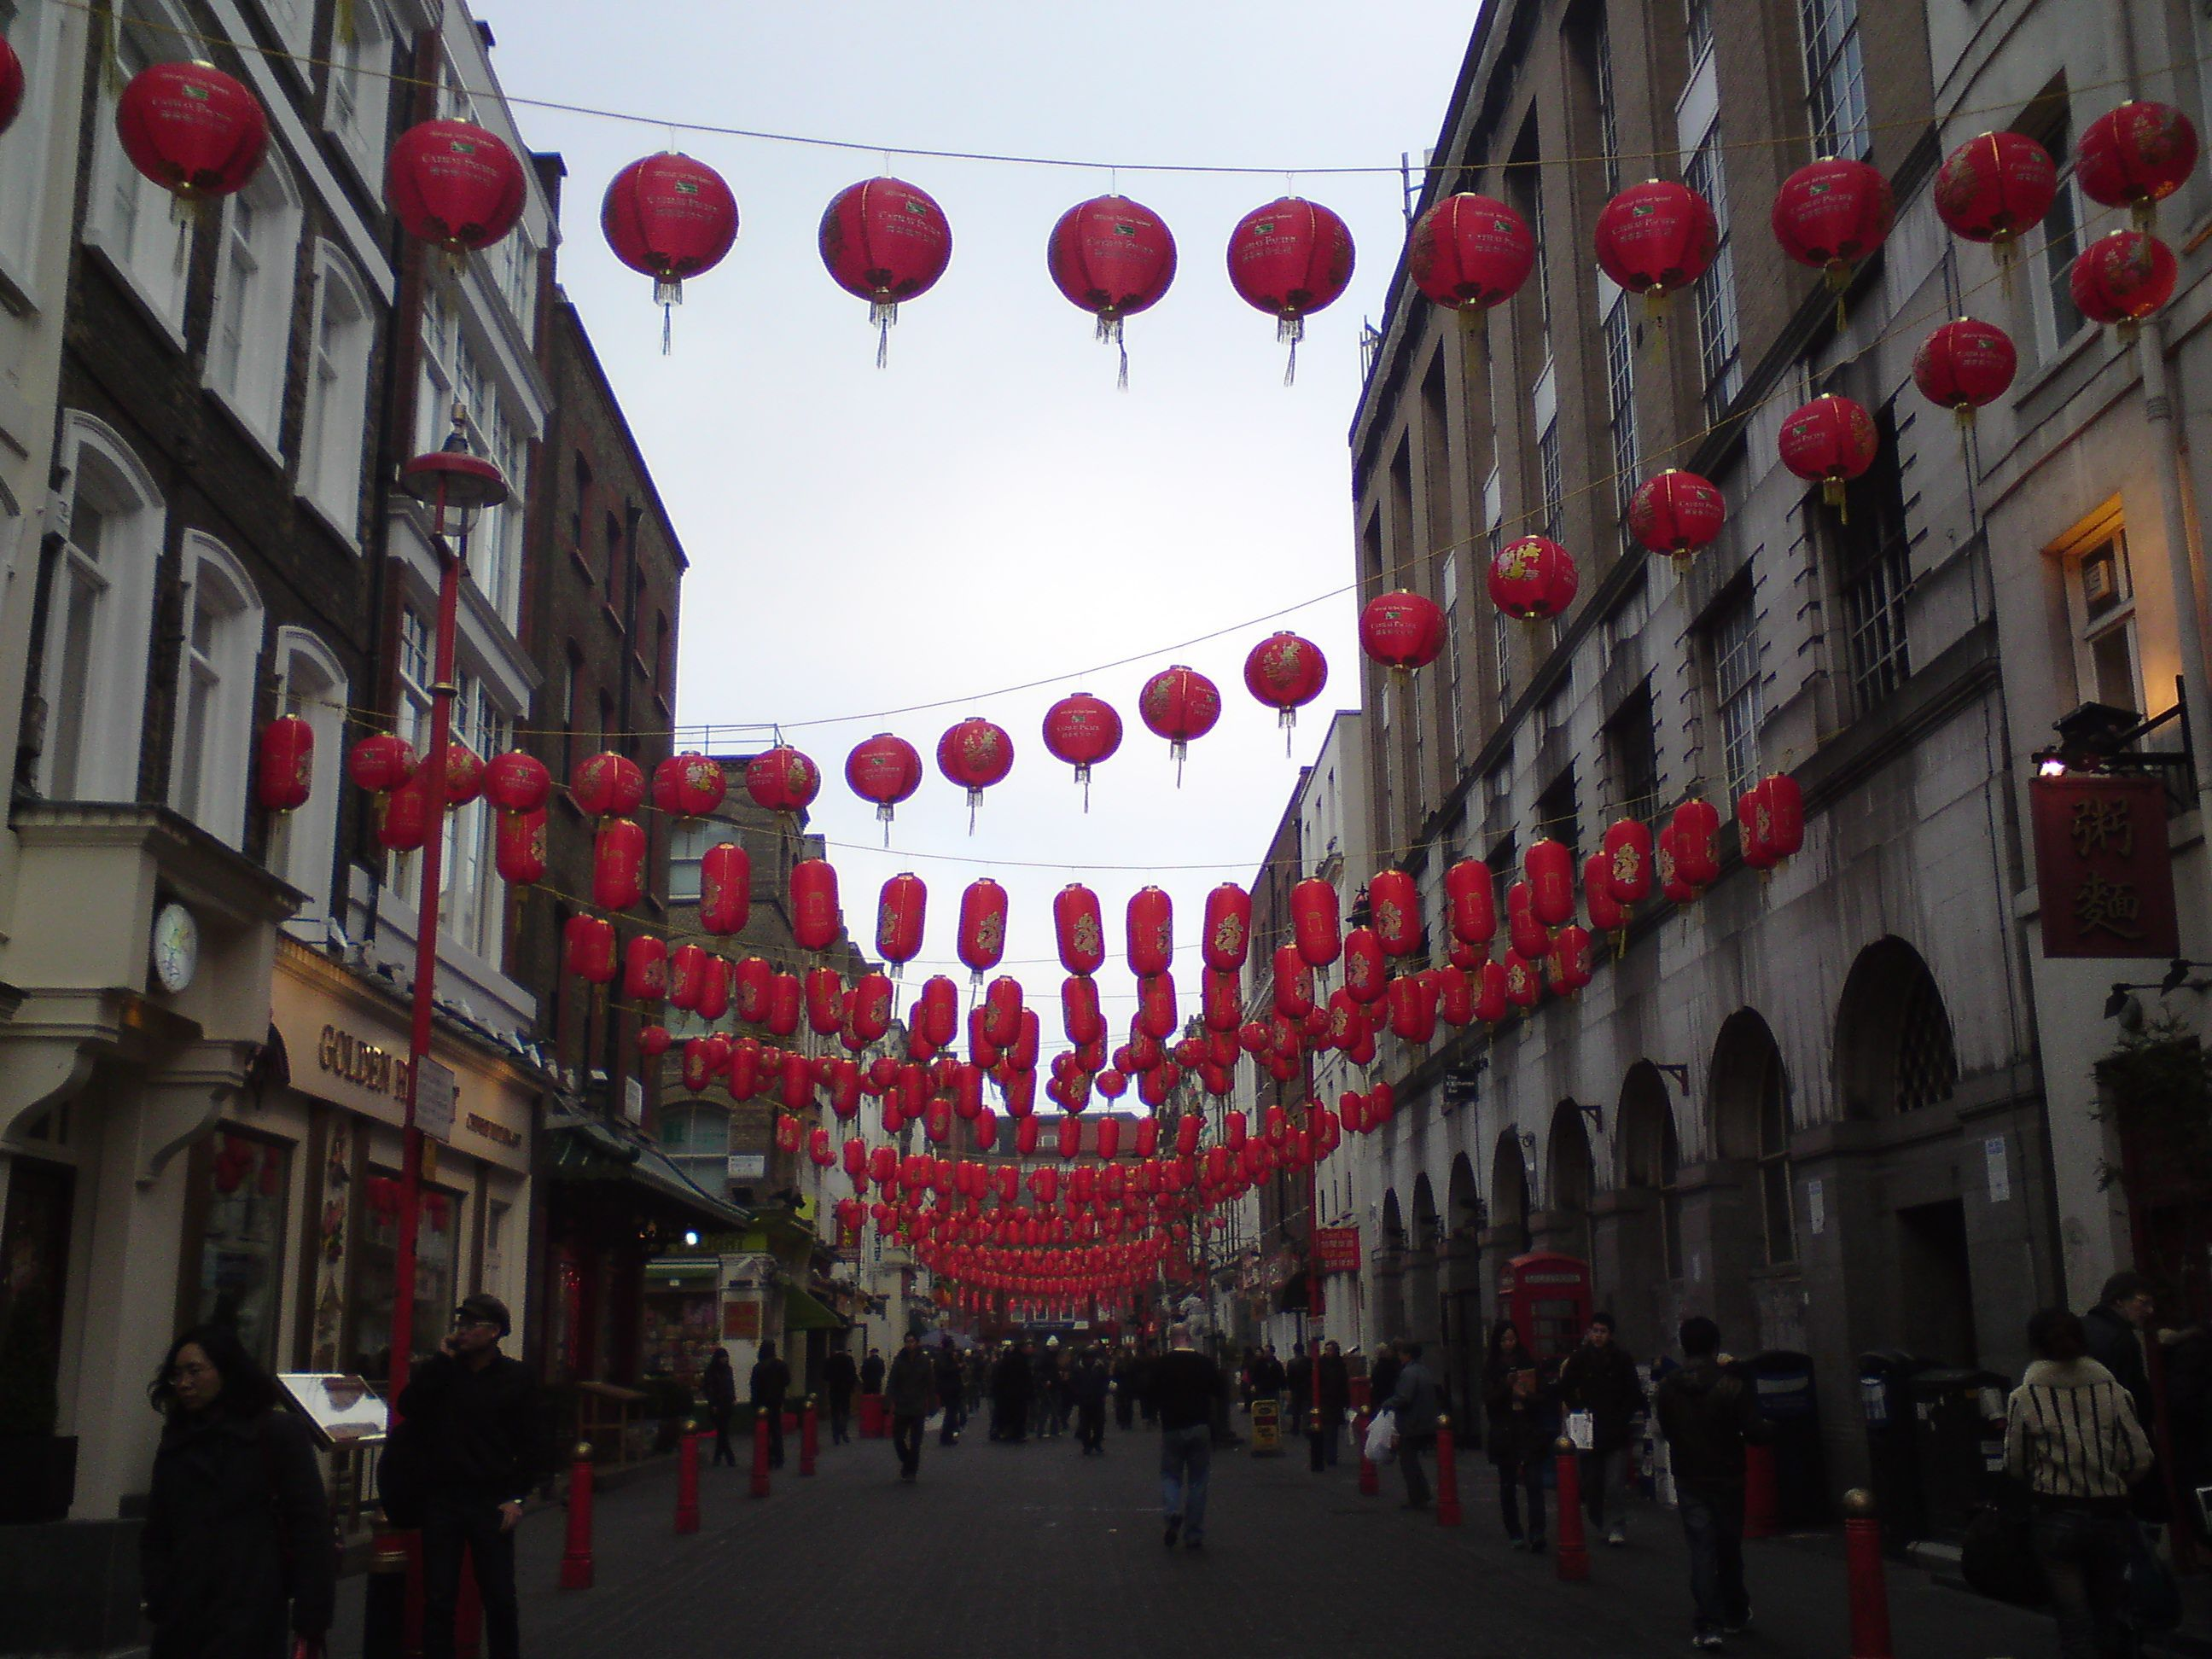 Chinatown, London. Chinese New Year decorations. Next ...